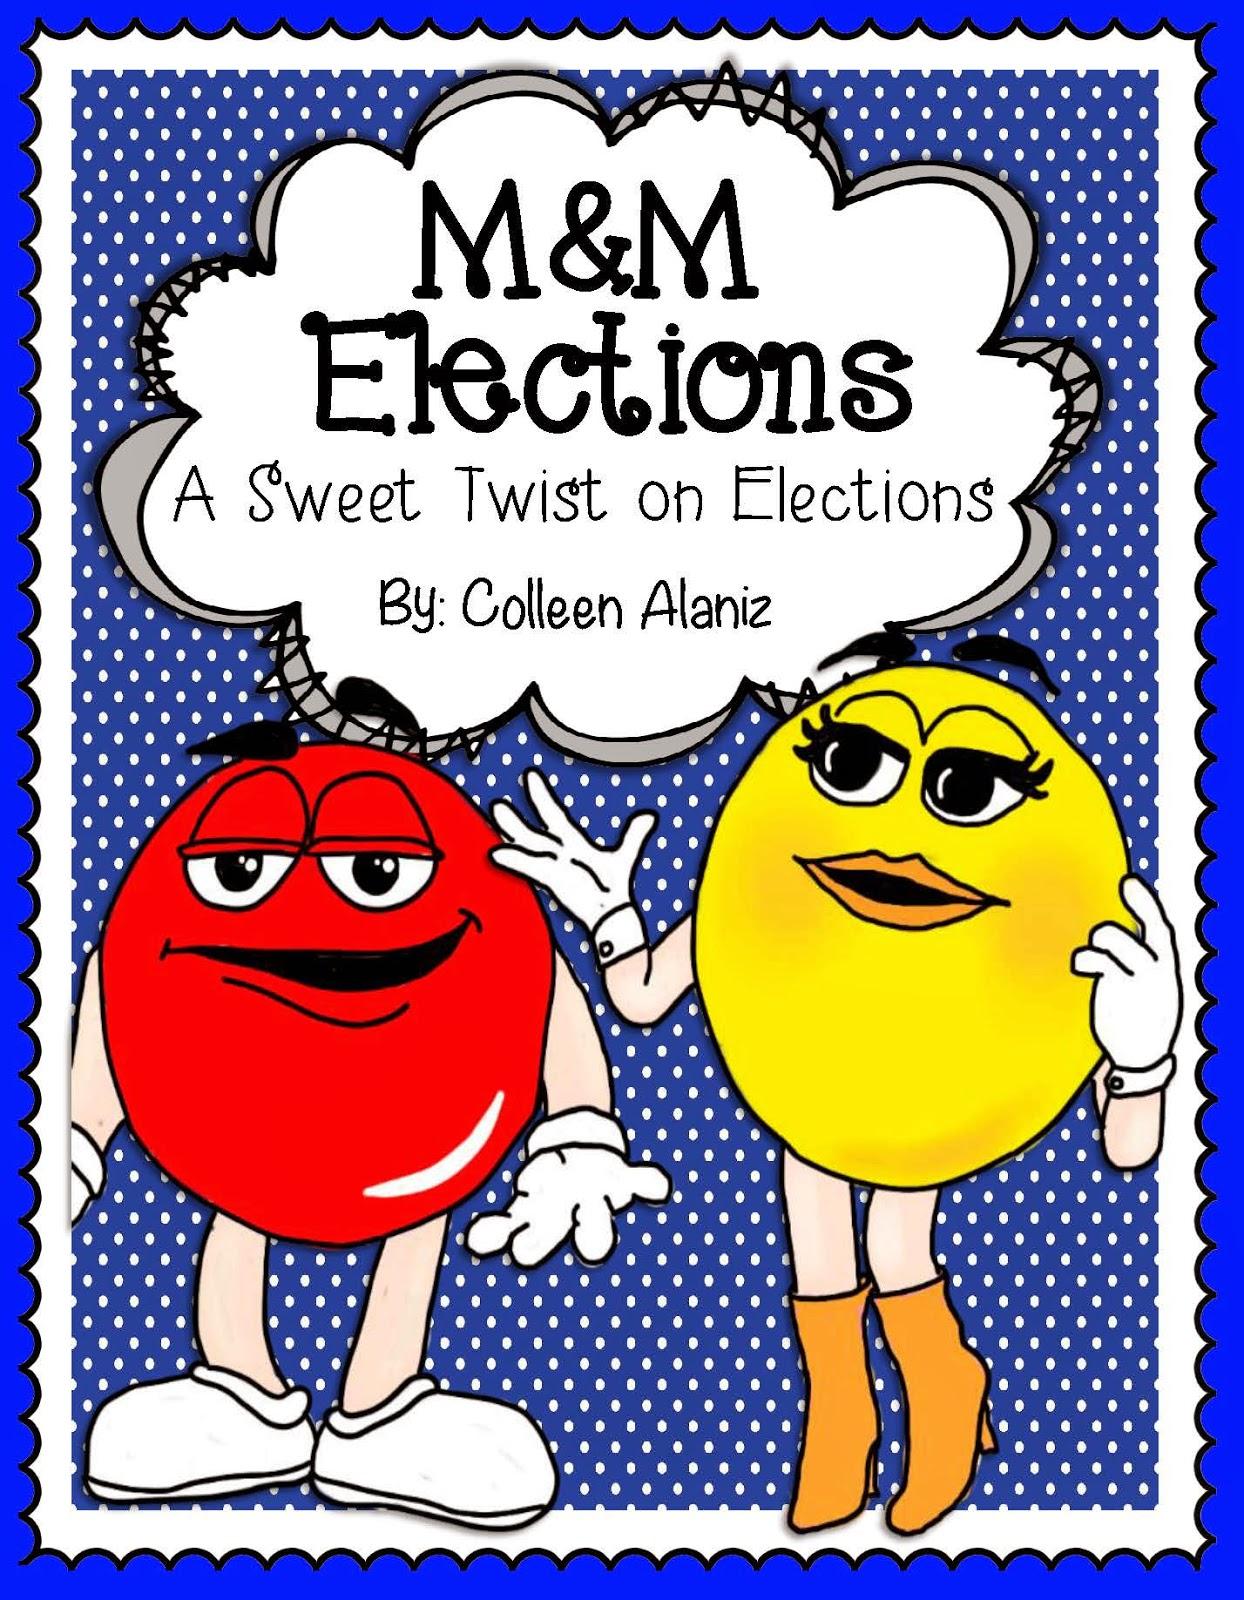 http://www.teacherspayteachers.com/Product/MM-Elections-1175985